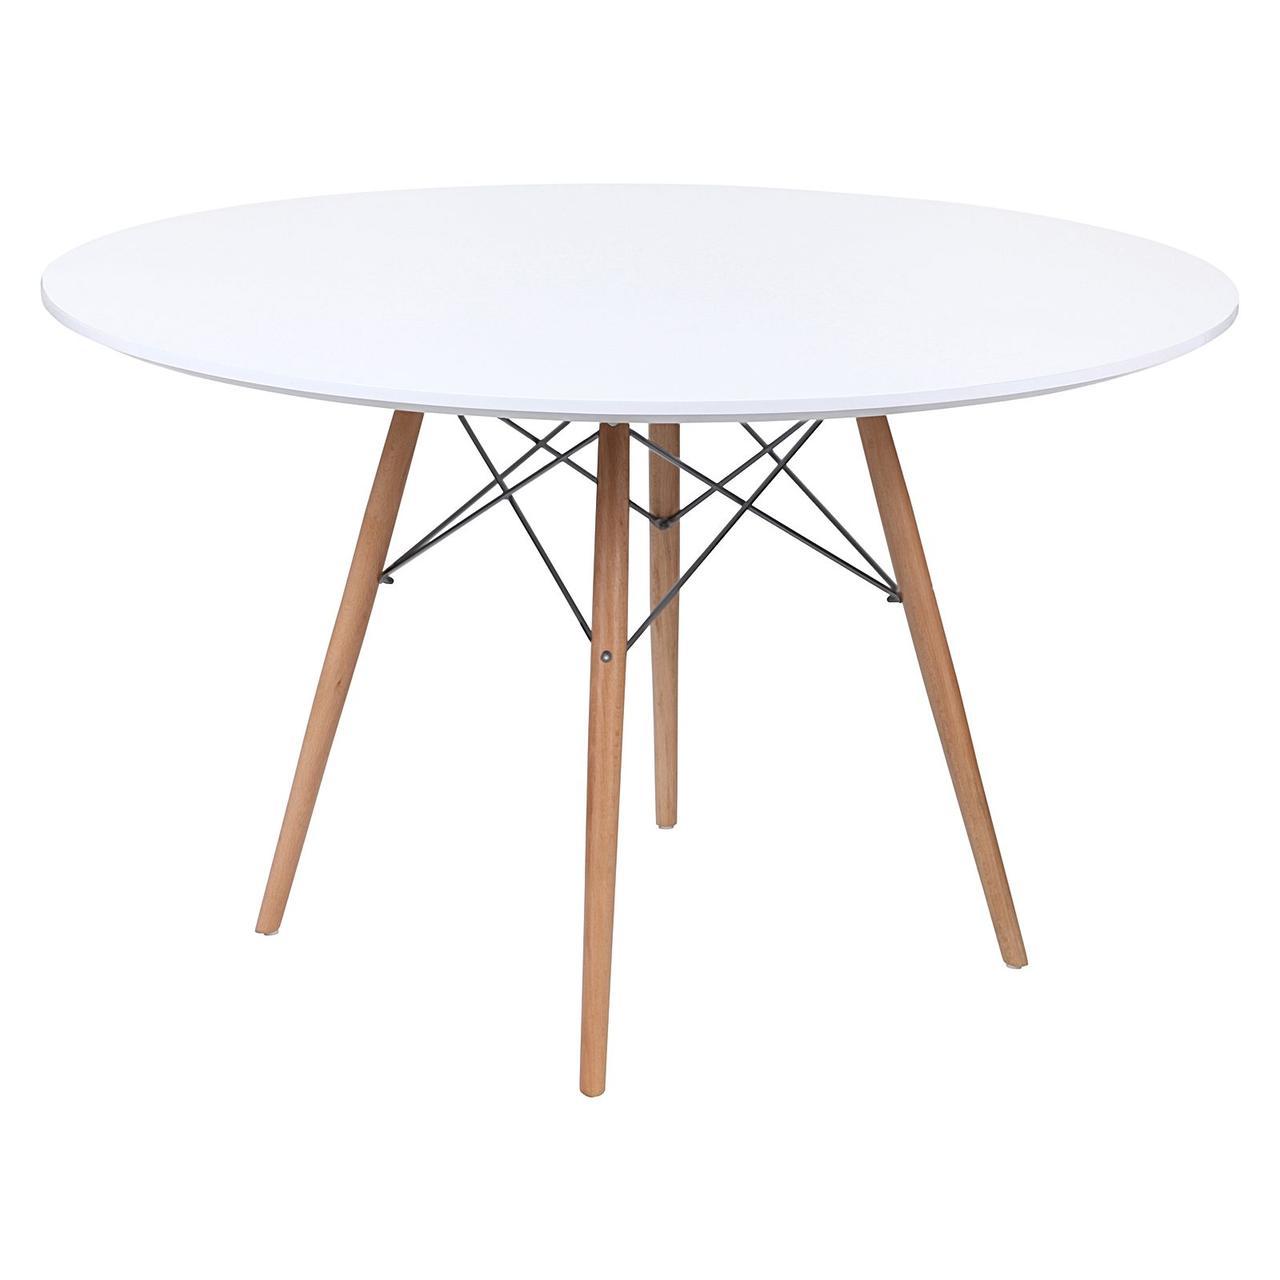 Стол обеденный Тауэр Вуд SDM, деревянный, бук, диаметр 120 см, цвет белый